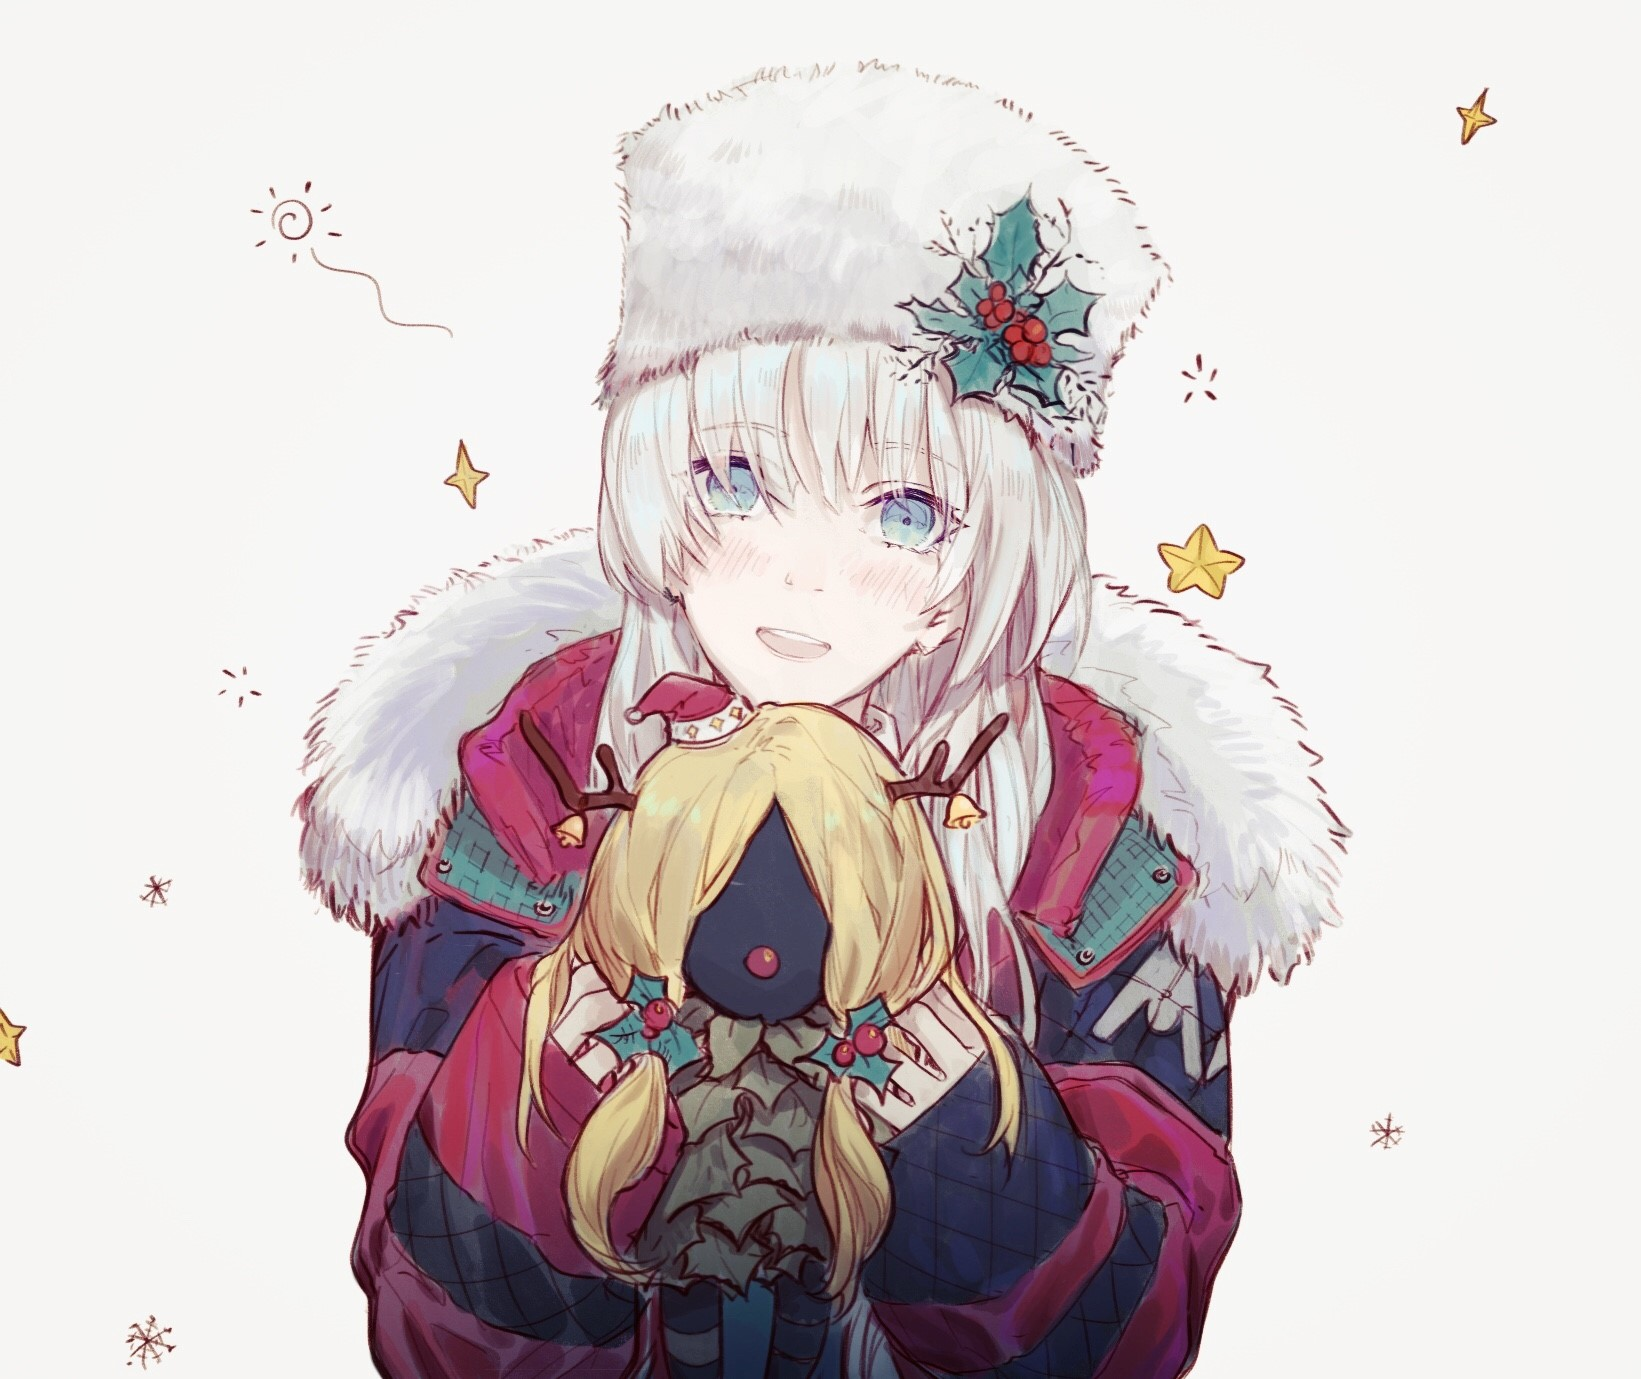 Shvibzik Snow Zerochan Anime Image Board Thank you for your understanding. shvibzik snow zerochan anime image board